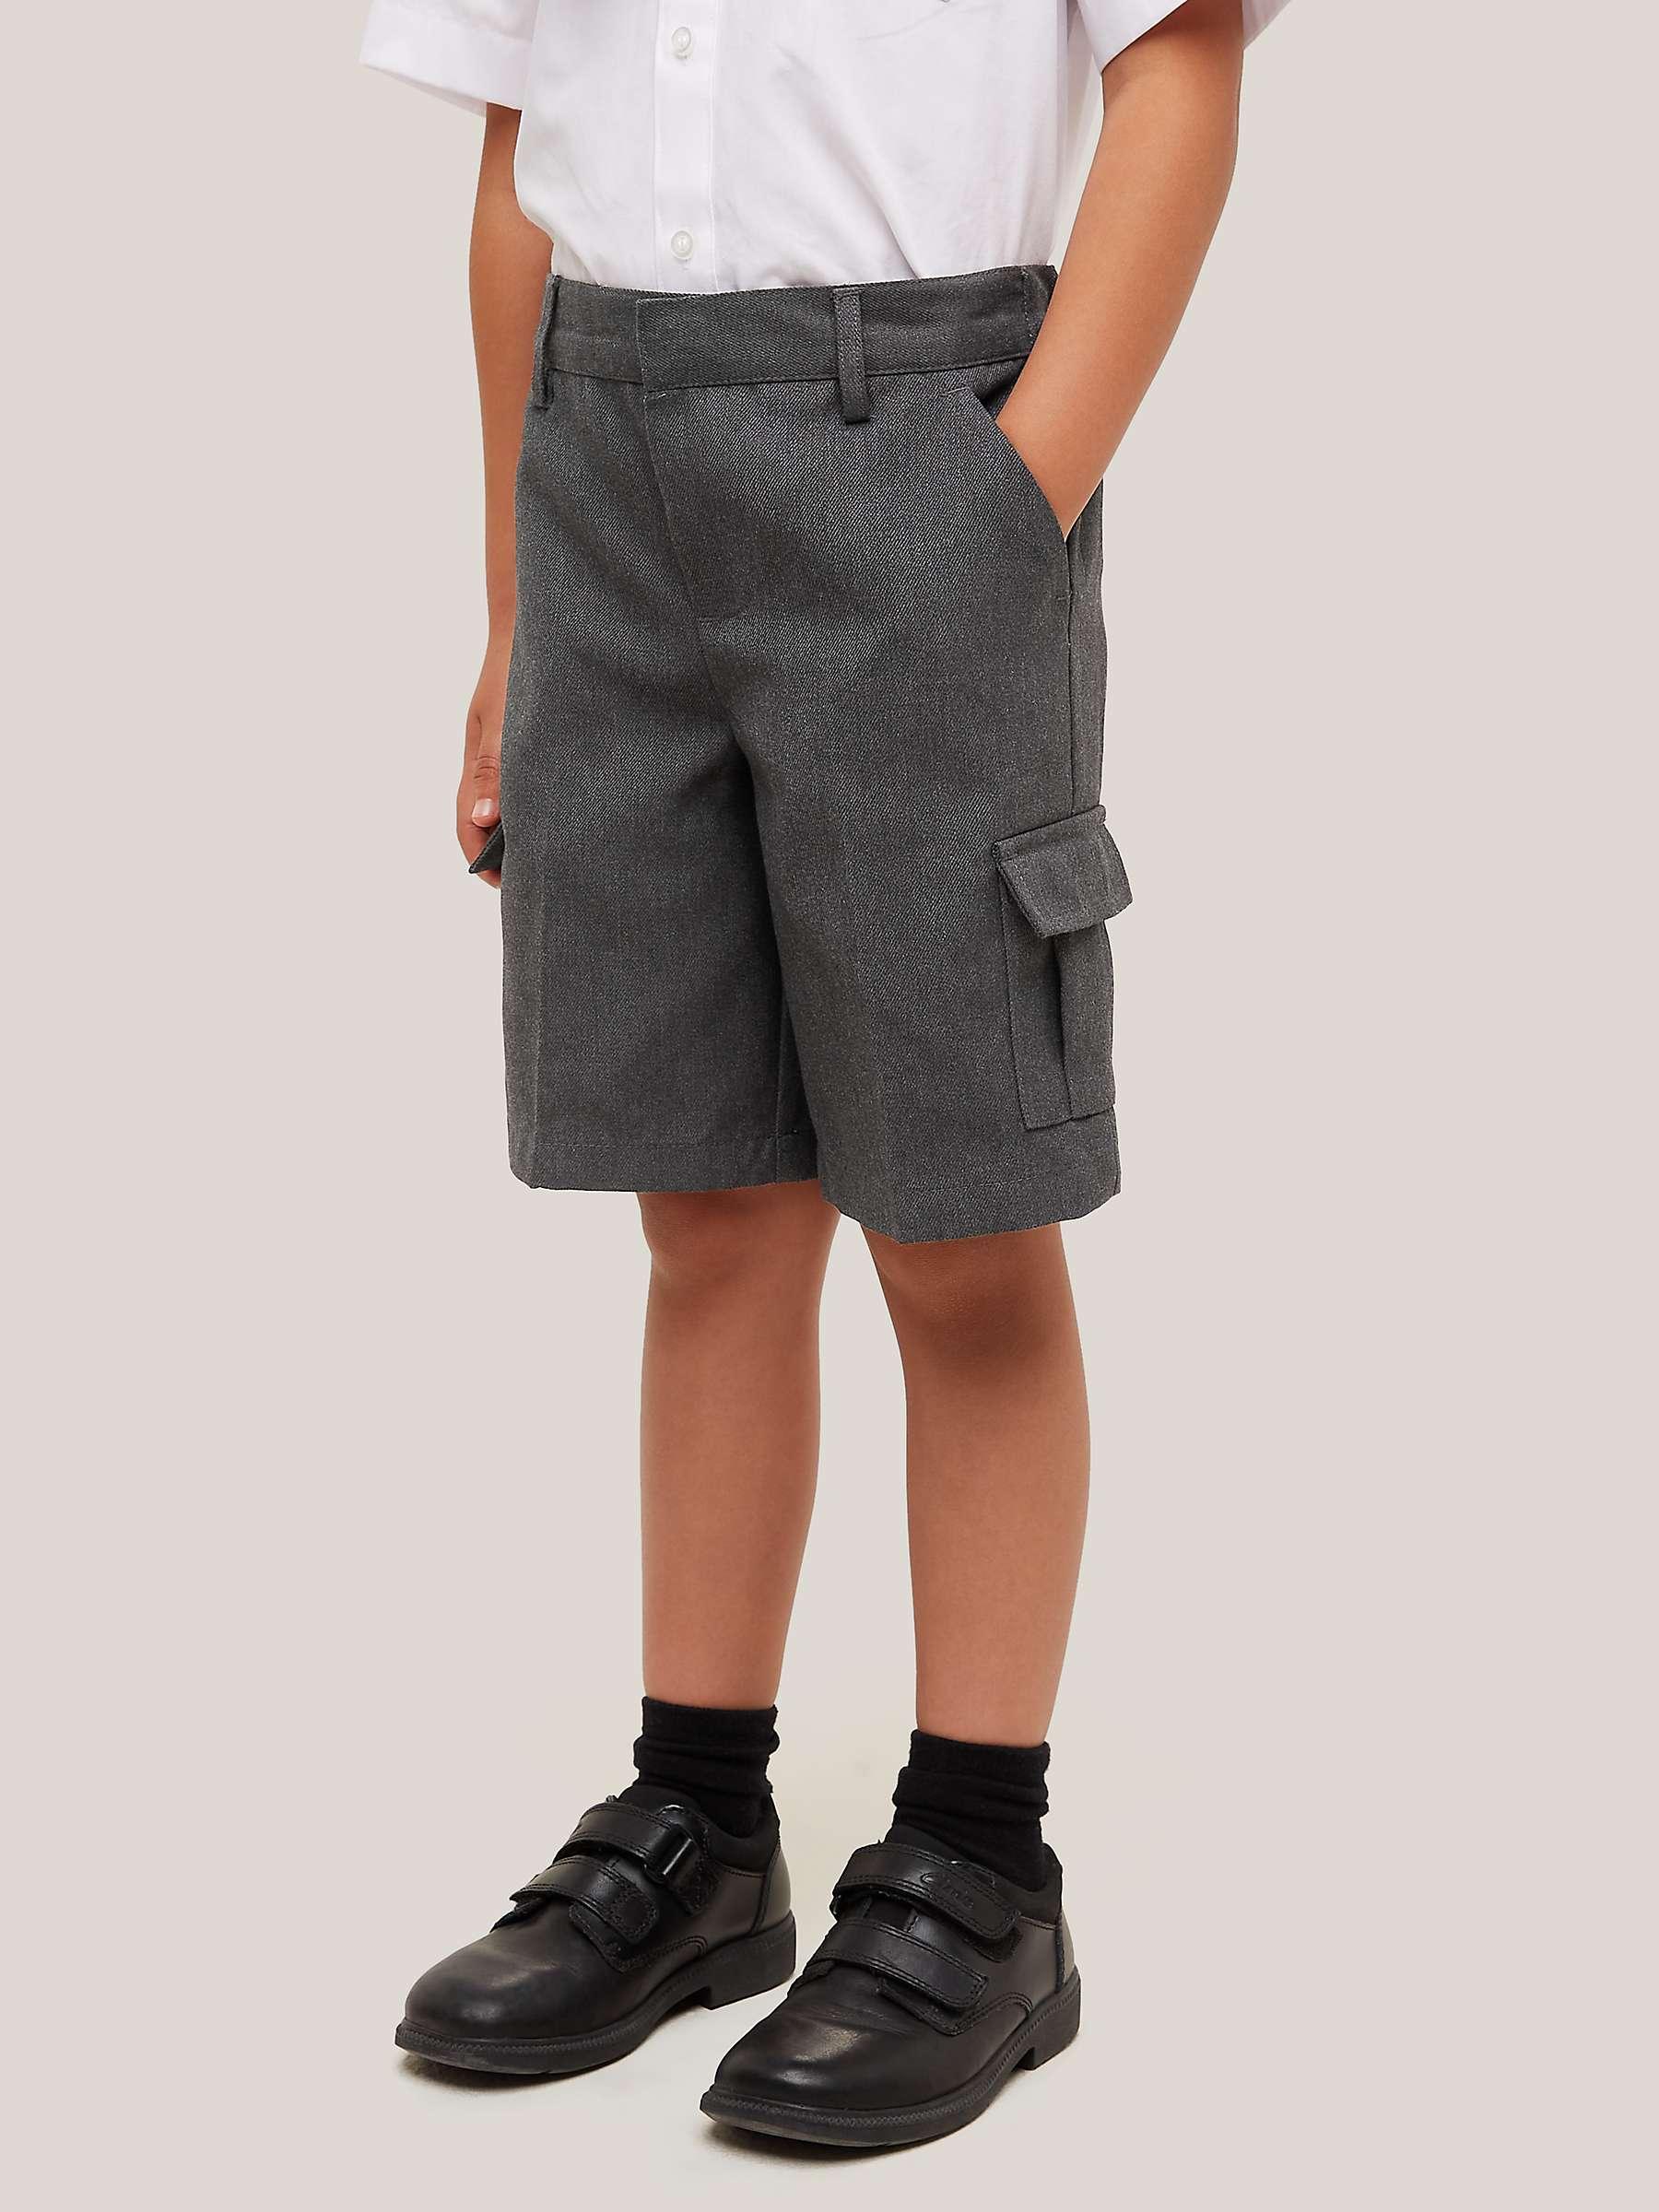 BLACK//GREY//NAVY AGES 2-12YRS SCHOOL BOYS SHORTS TEFLON PROTECTOR